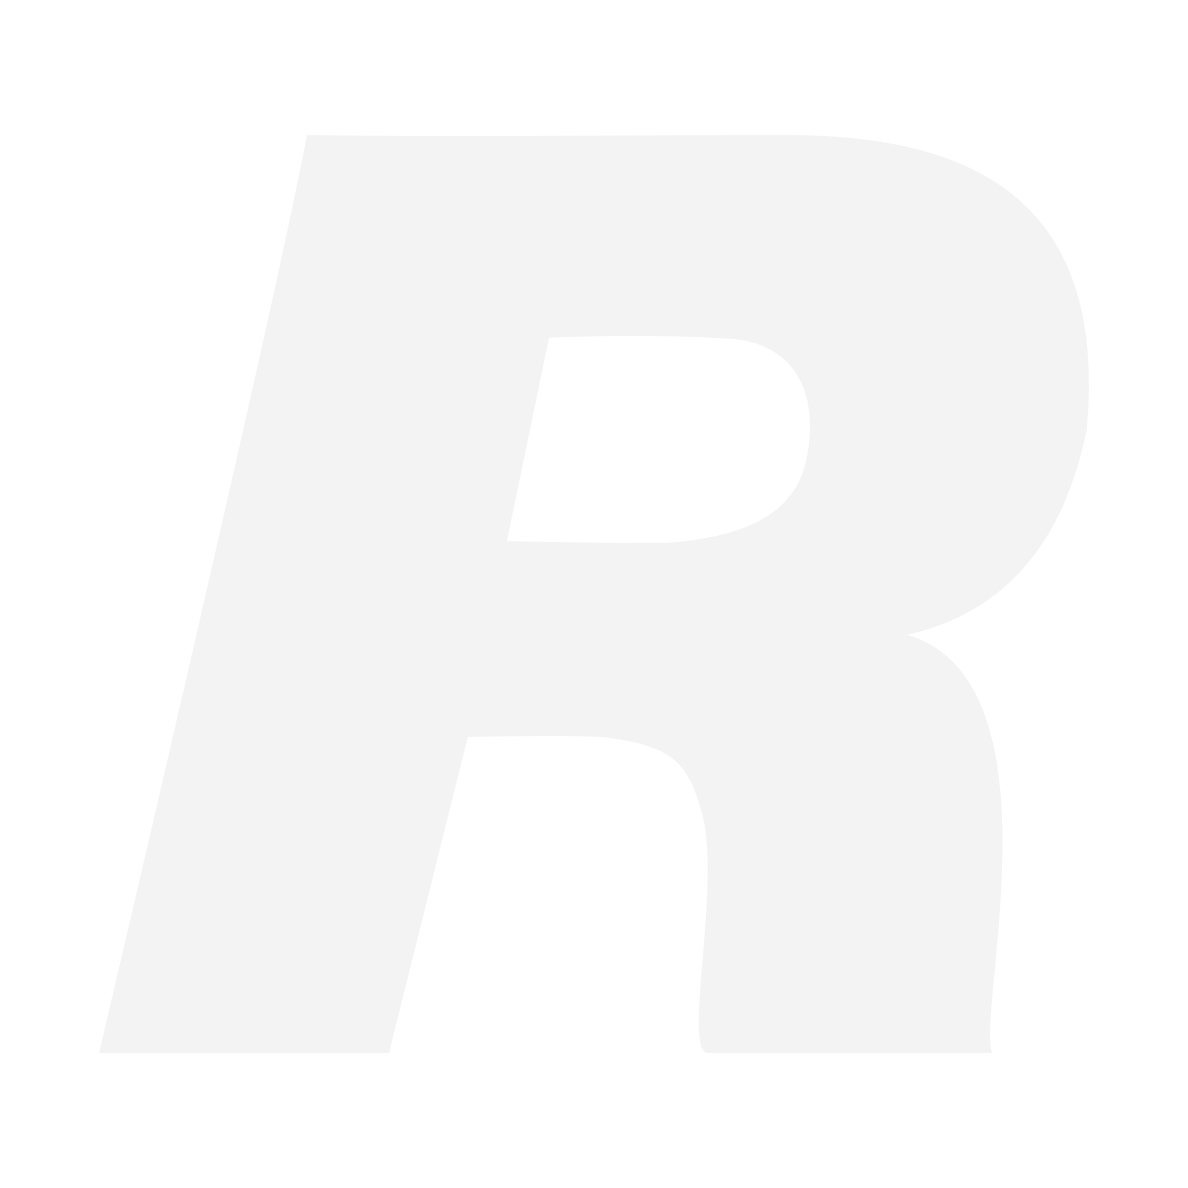 Micnova Rajala Digital Harmaakortti